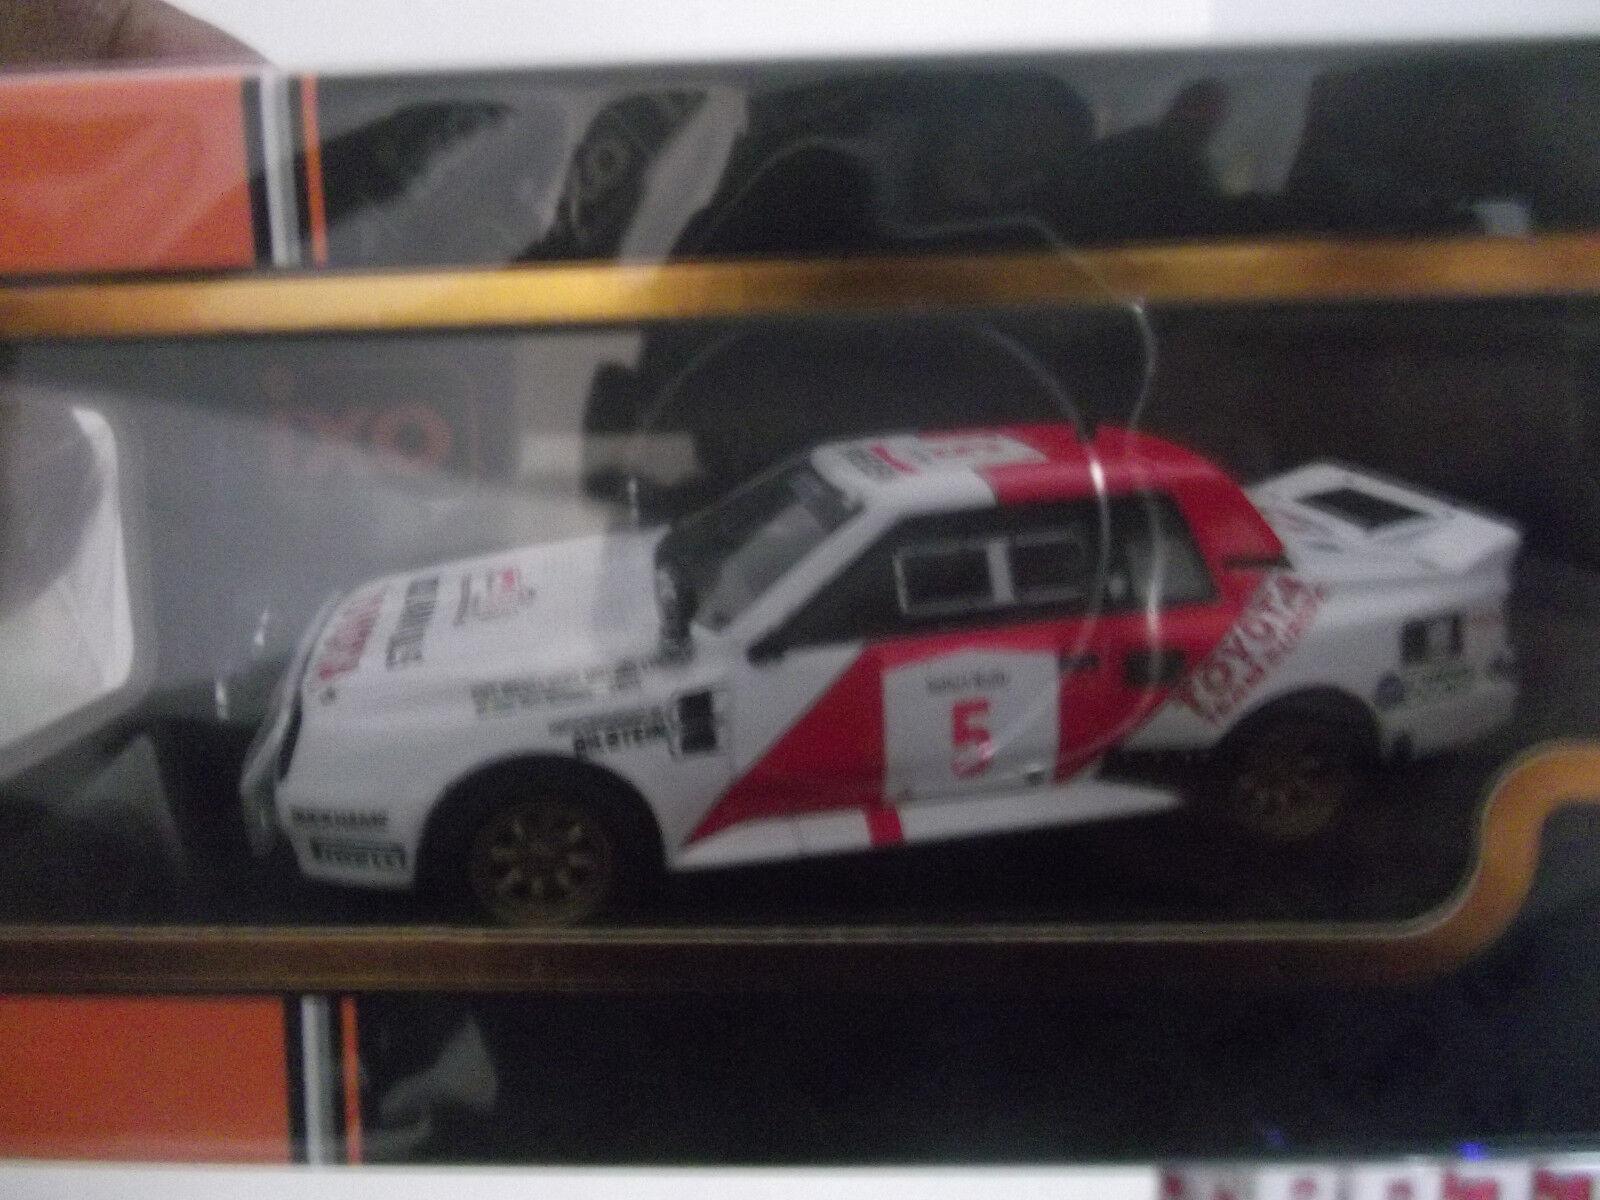 Toyota Celica Twincam Turbo Safari Rally 1984 1984 1984 Waldegård 1 43 Ixo Rac 258 076d8e